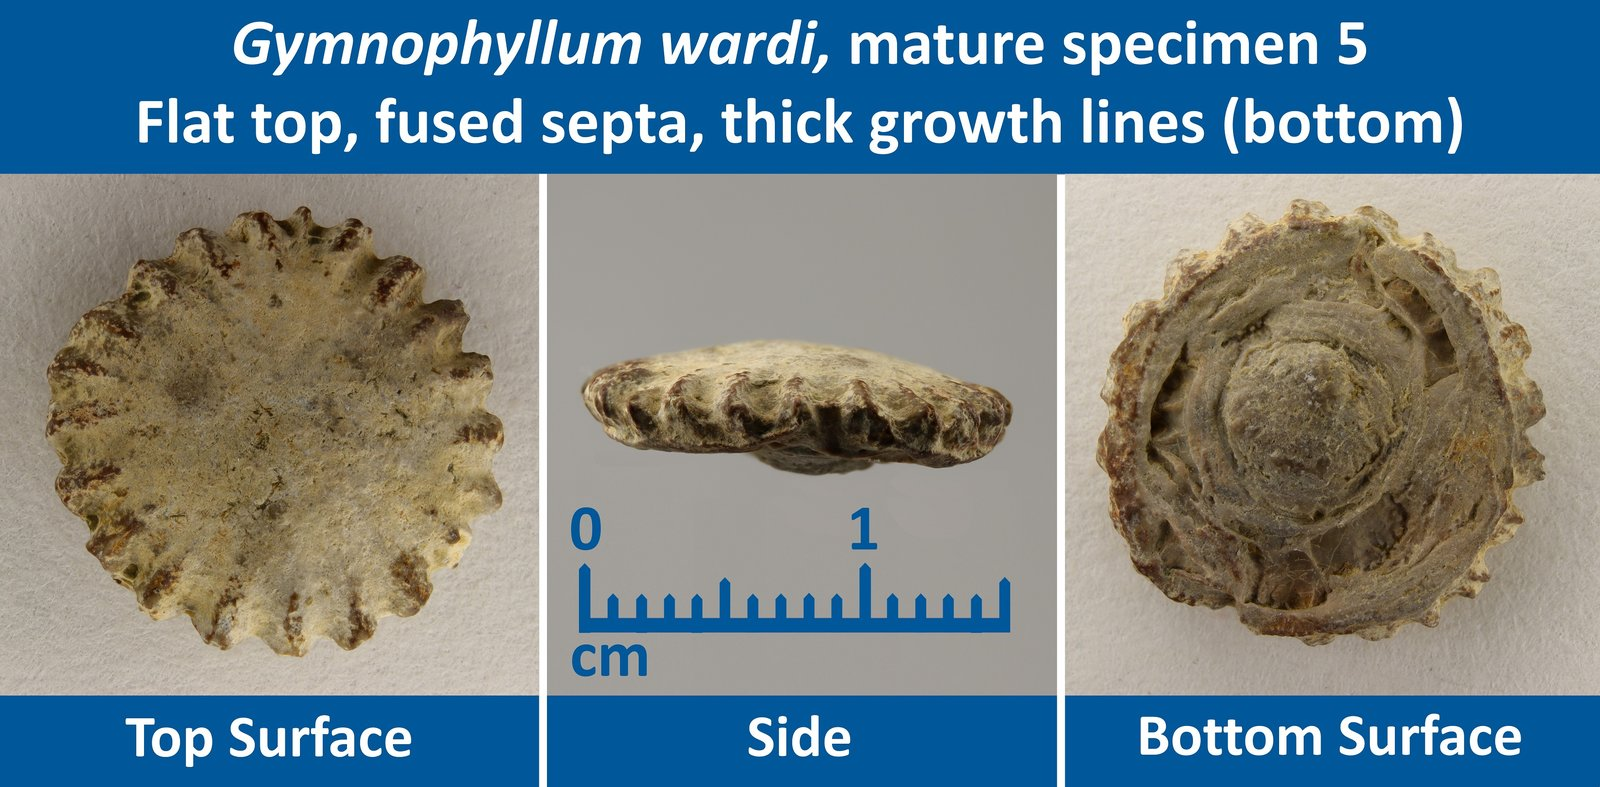 10 Gymnophyllum wardi Mature Specimen 05 Flat top, Fused Septae, Thick growth lines